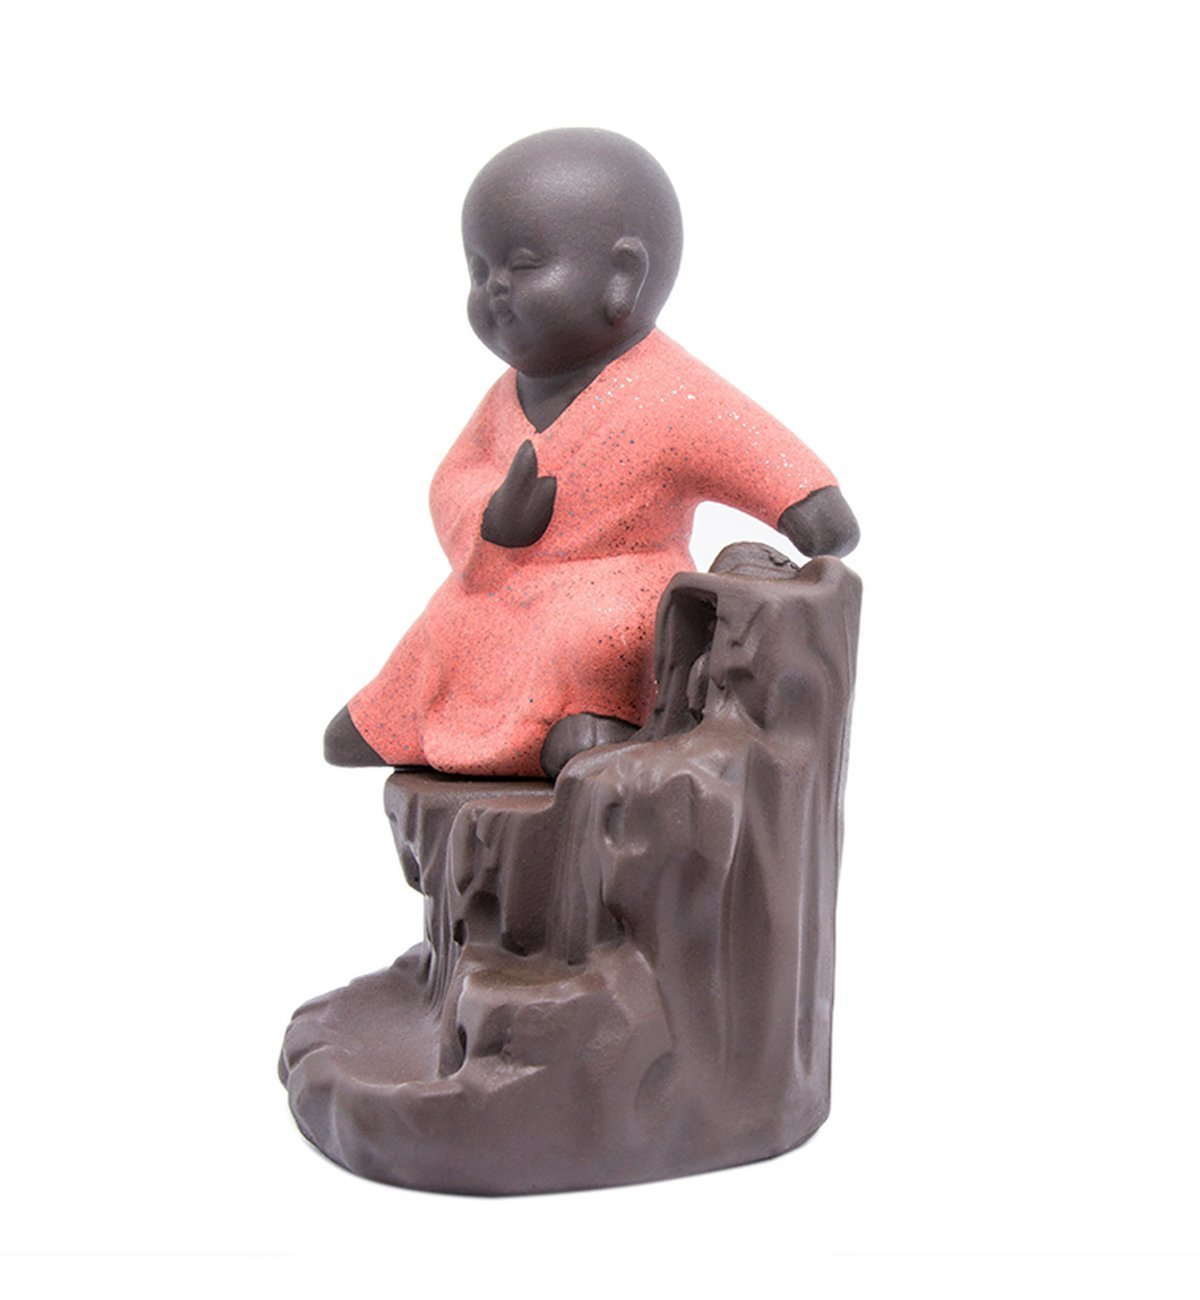 CORCIO Incense Burner Backflow Tower Cones Sticks Holder Ceramic Porcelain Buddha Monk Ash Catcher-IN008Red